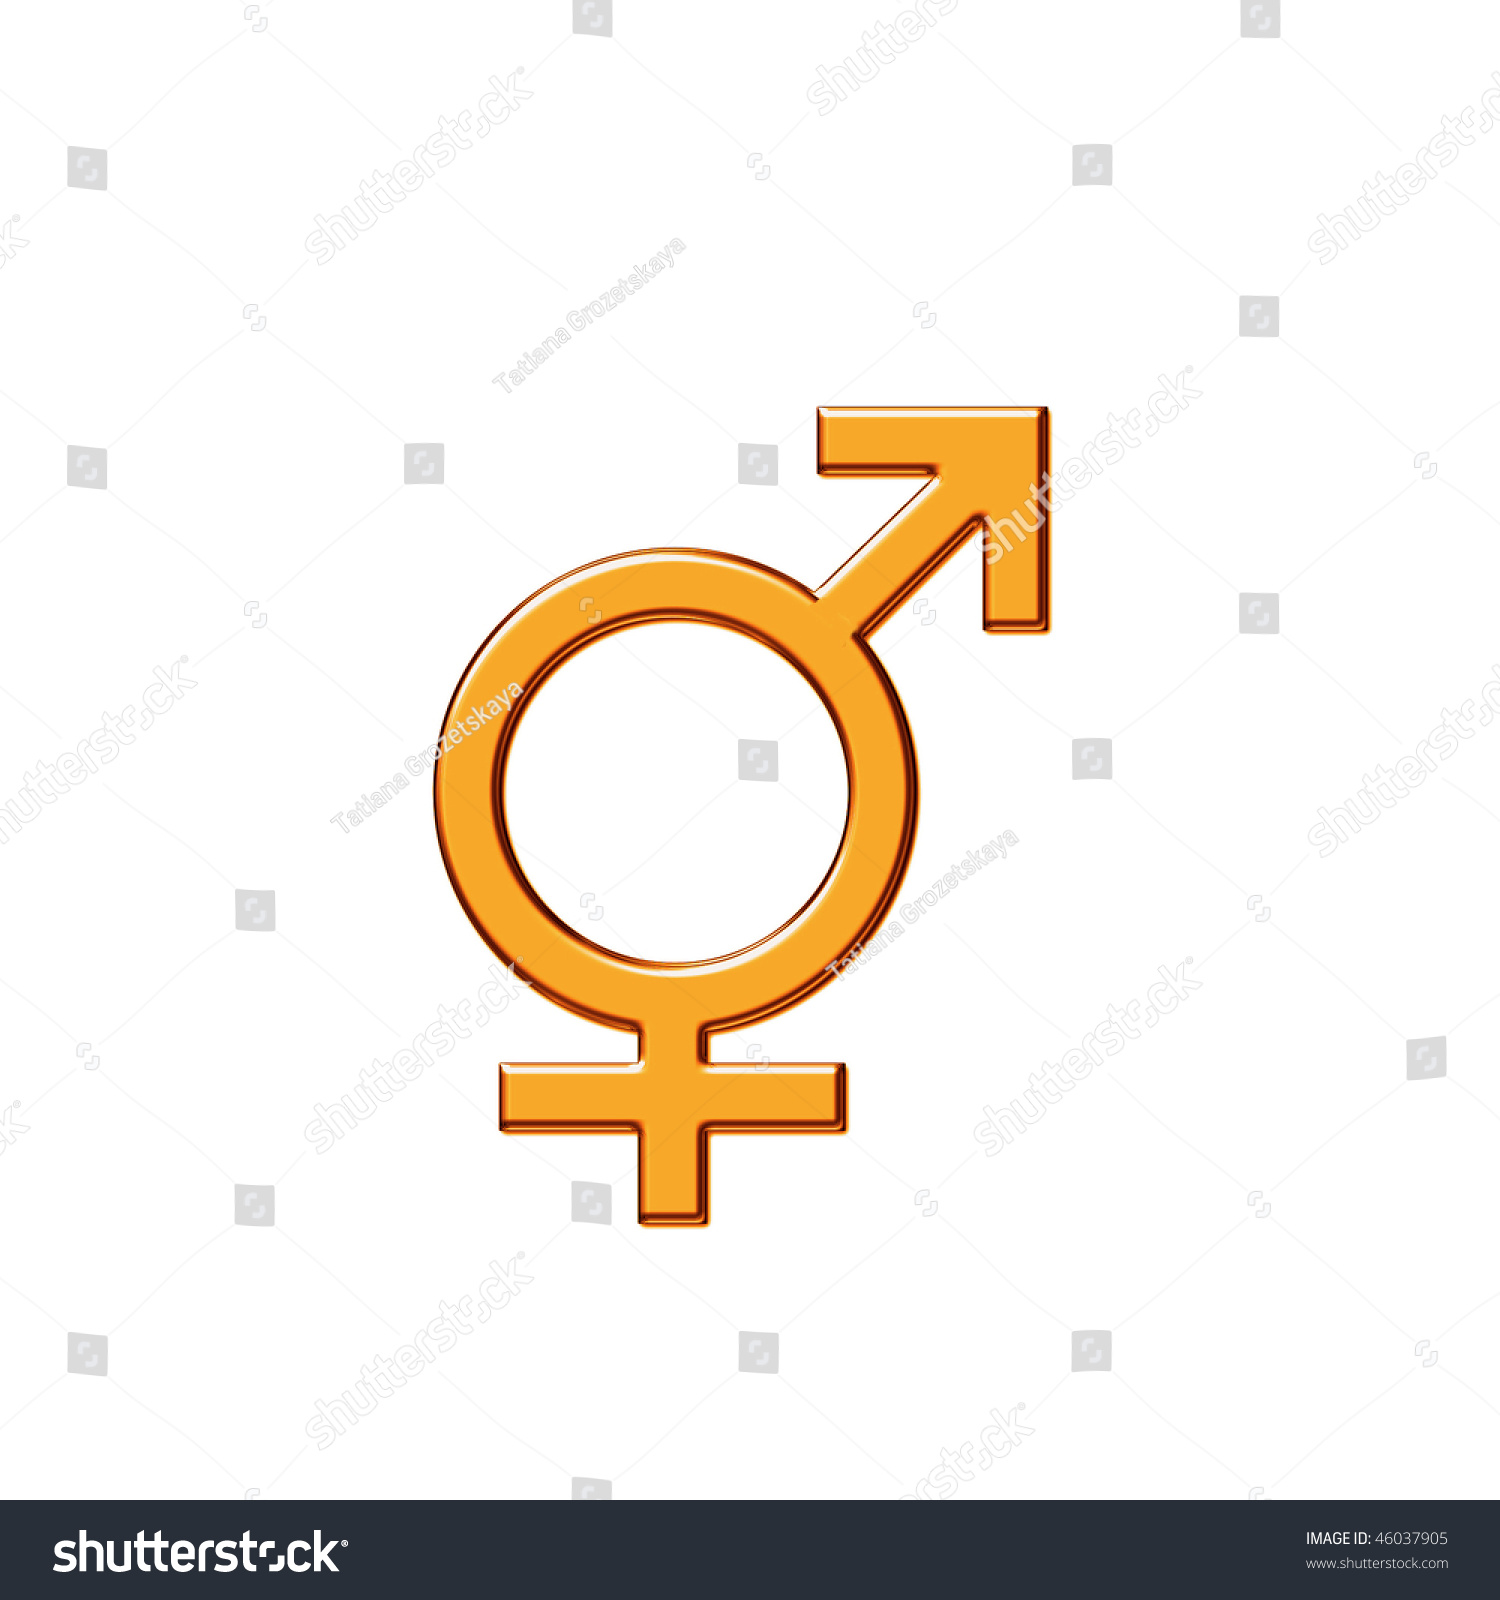 Symbol Unity Male Female Beginnings Love Stock Illustration